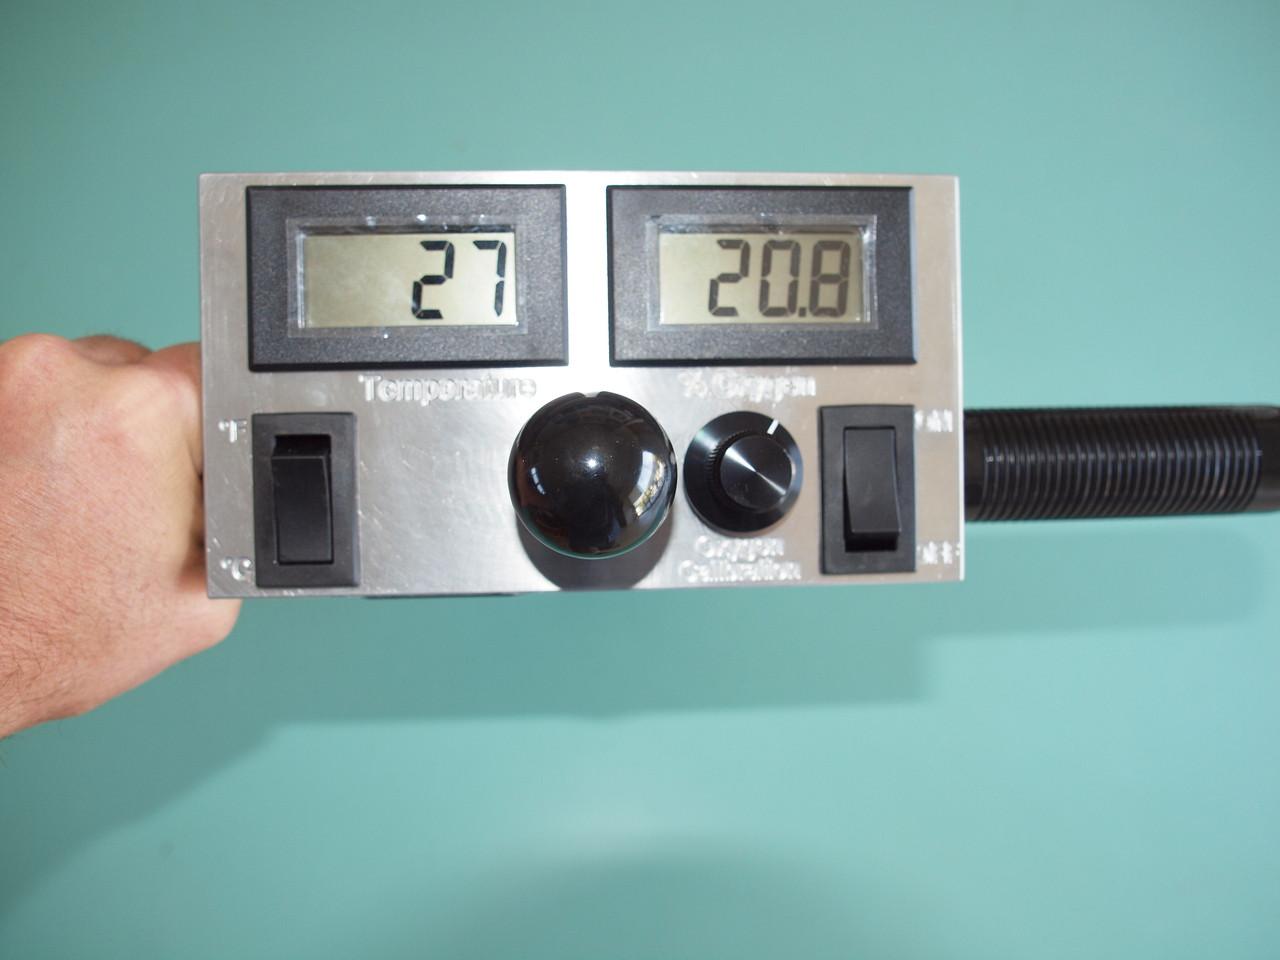 Reotemp Oxytemp probe - digital